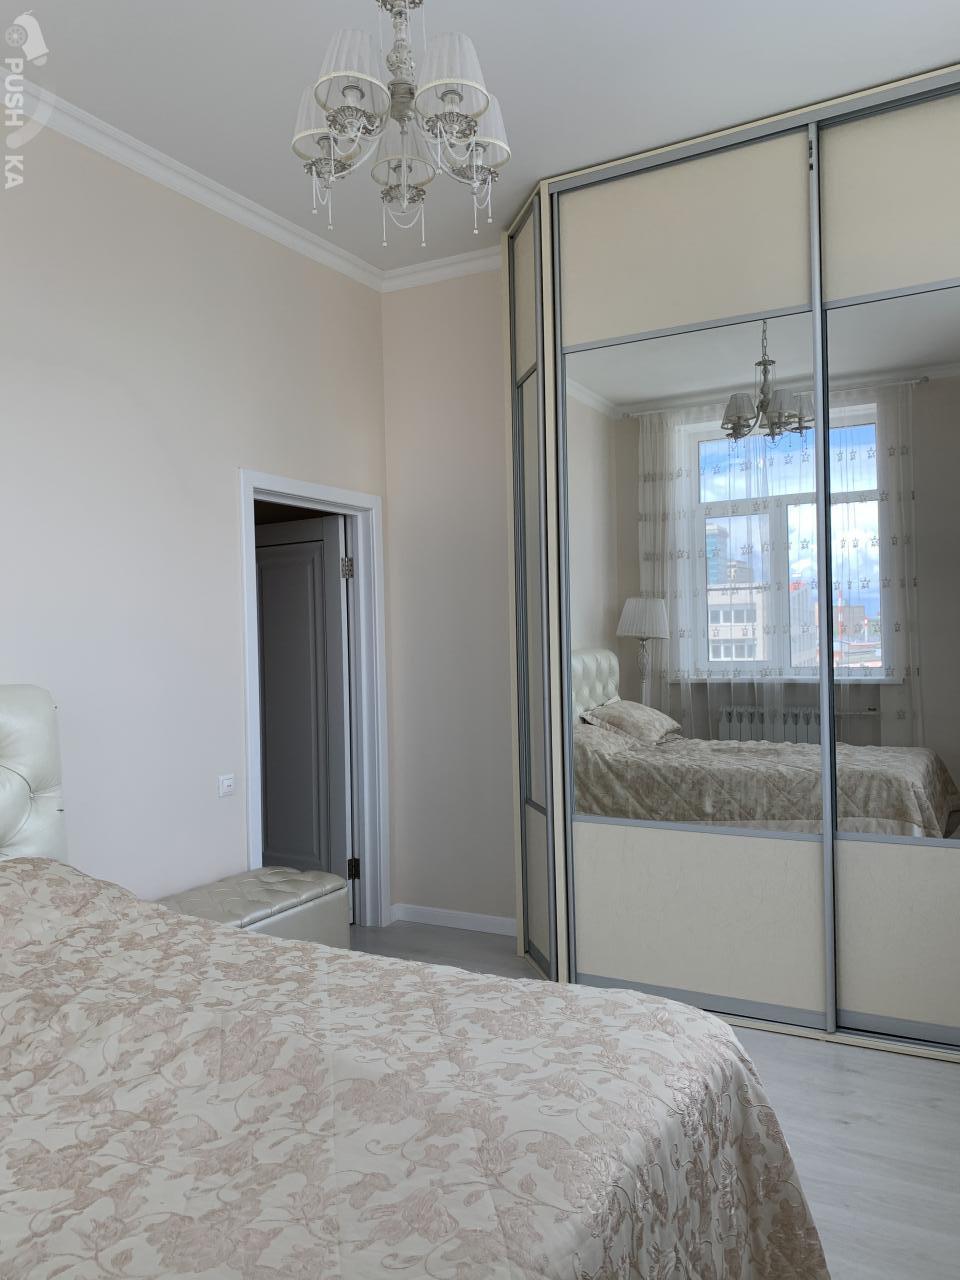 Продаётся 3-комнатная квартира 90.0 кв.м. этаж 7/8 за 25 000 000 руб